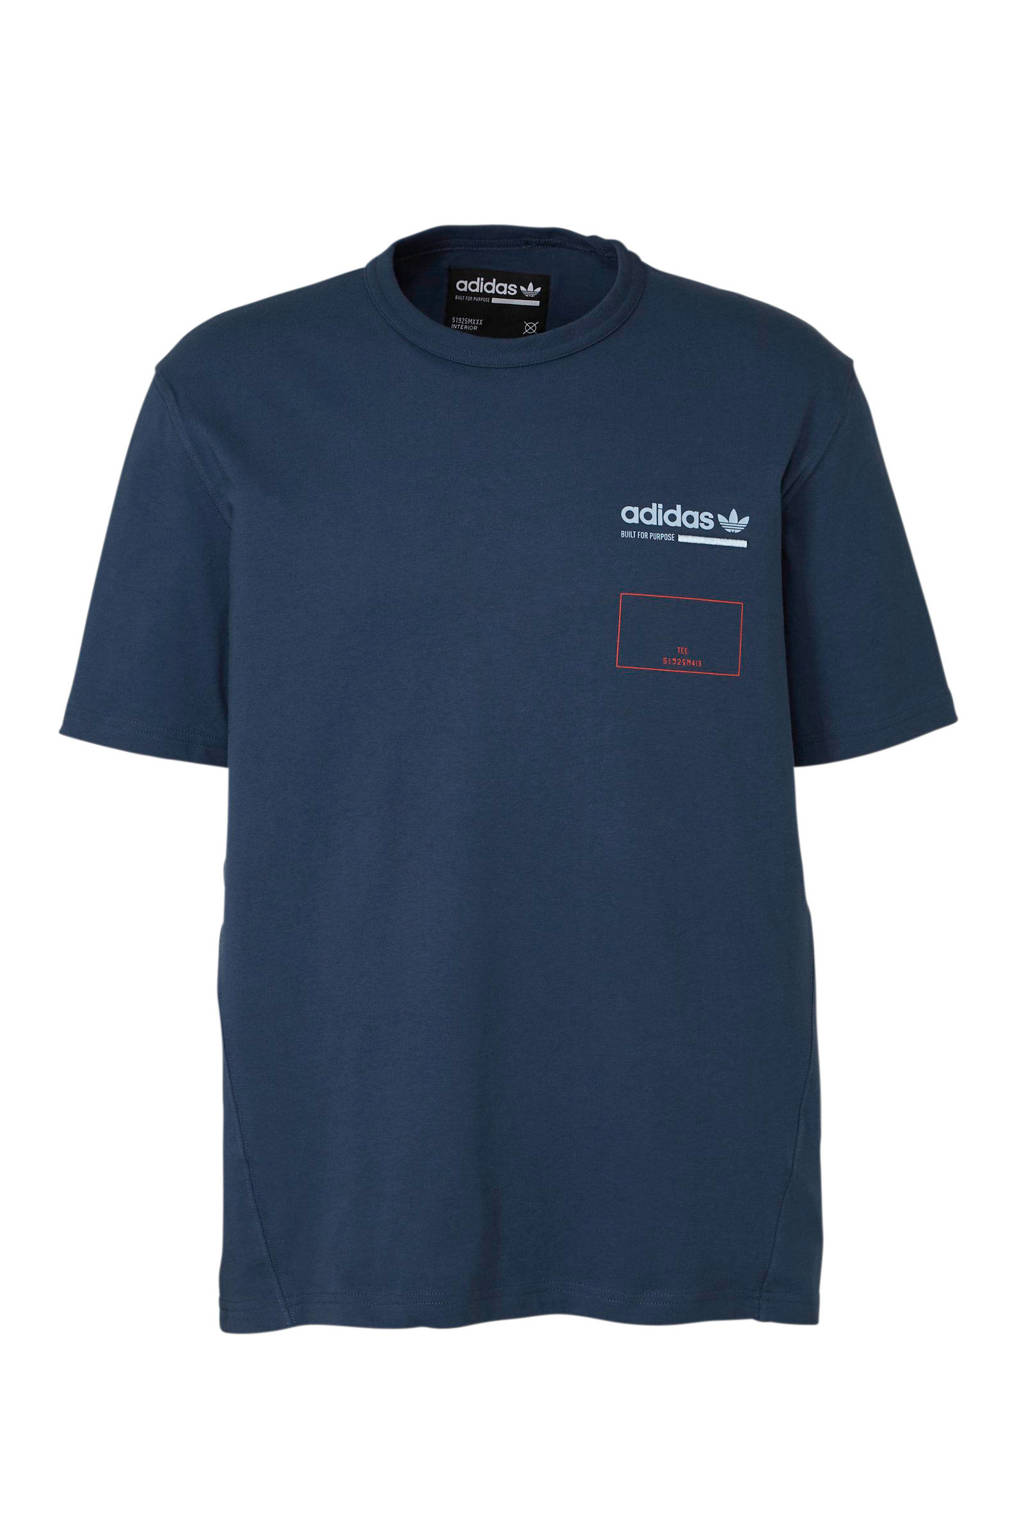 adidas originals   T-shirt, Blauw